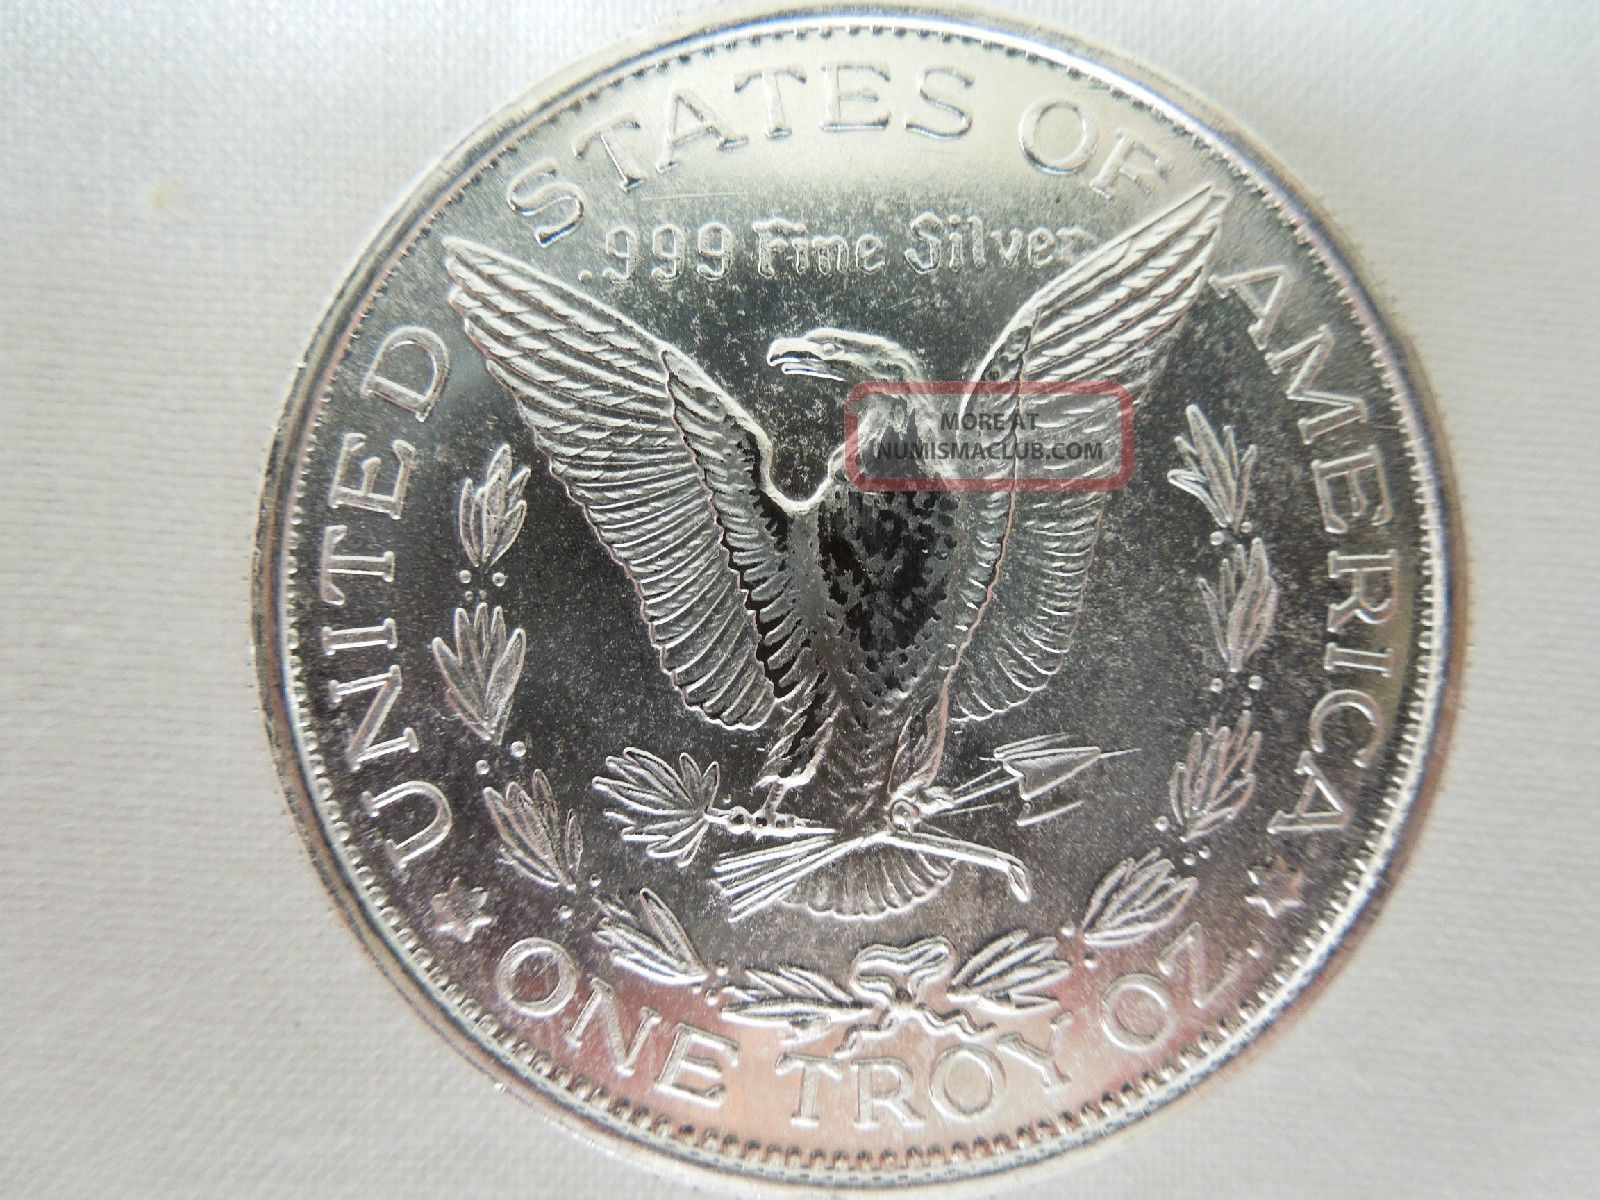 1 1 Oz 999 Fine Silver Round Morgan Dollar Design